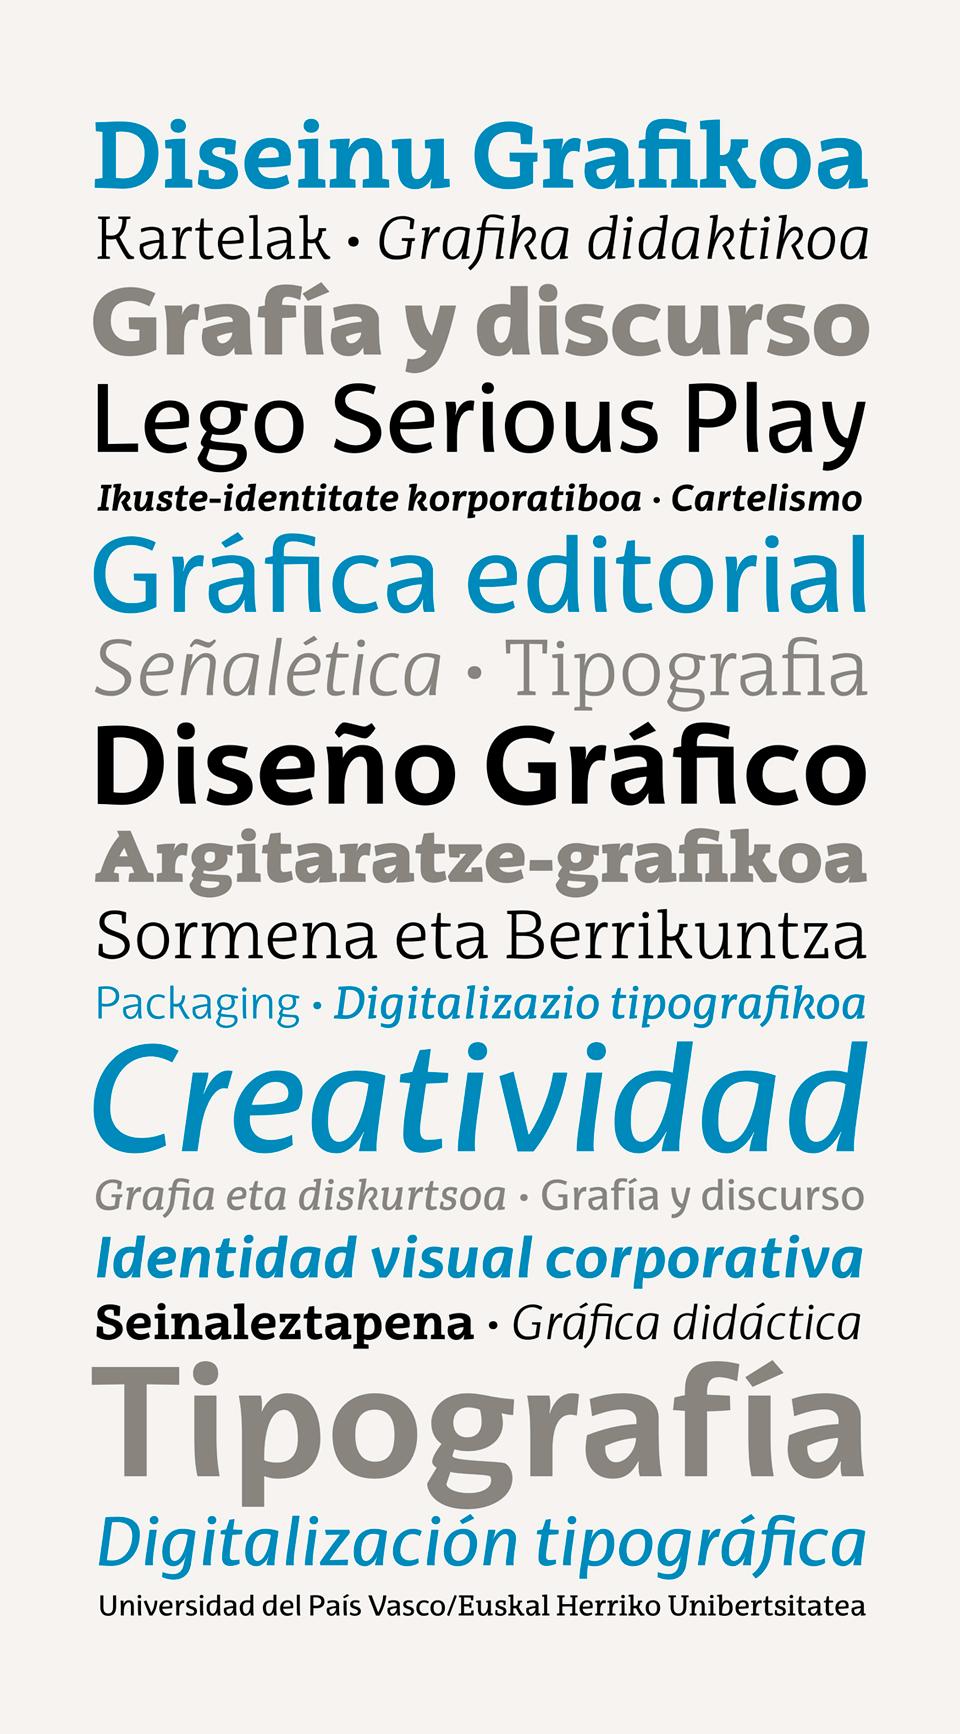 EHU Font Especimen